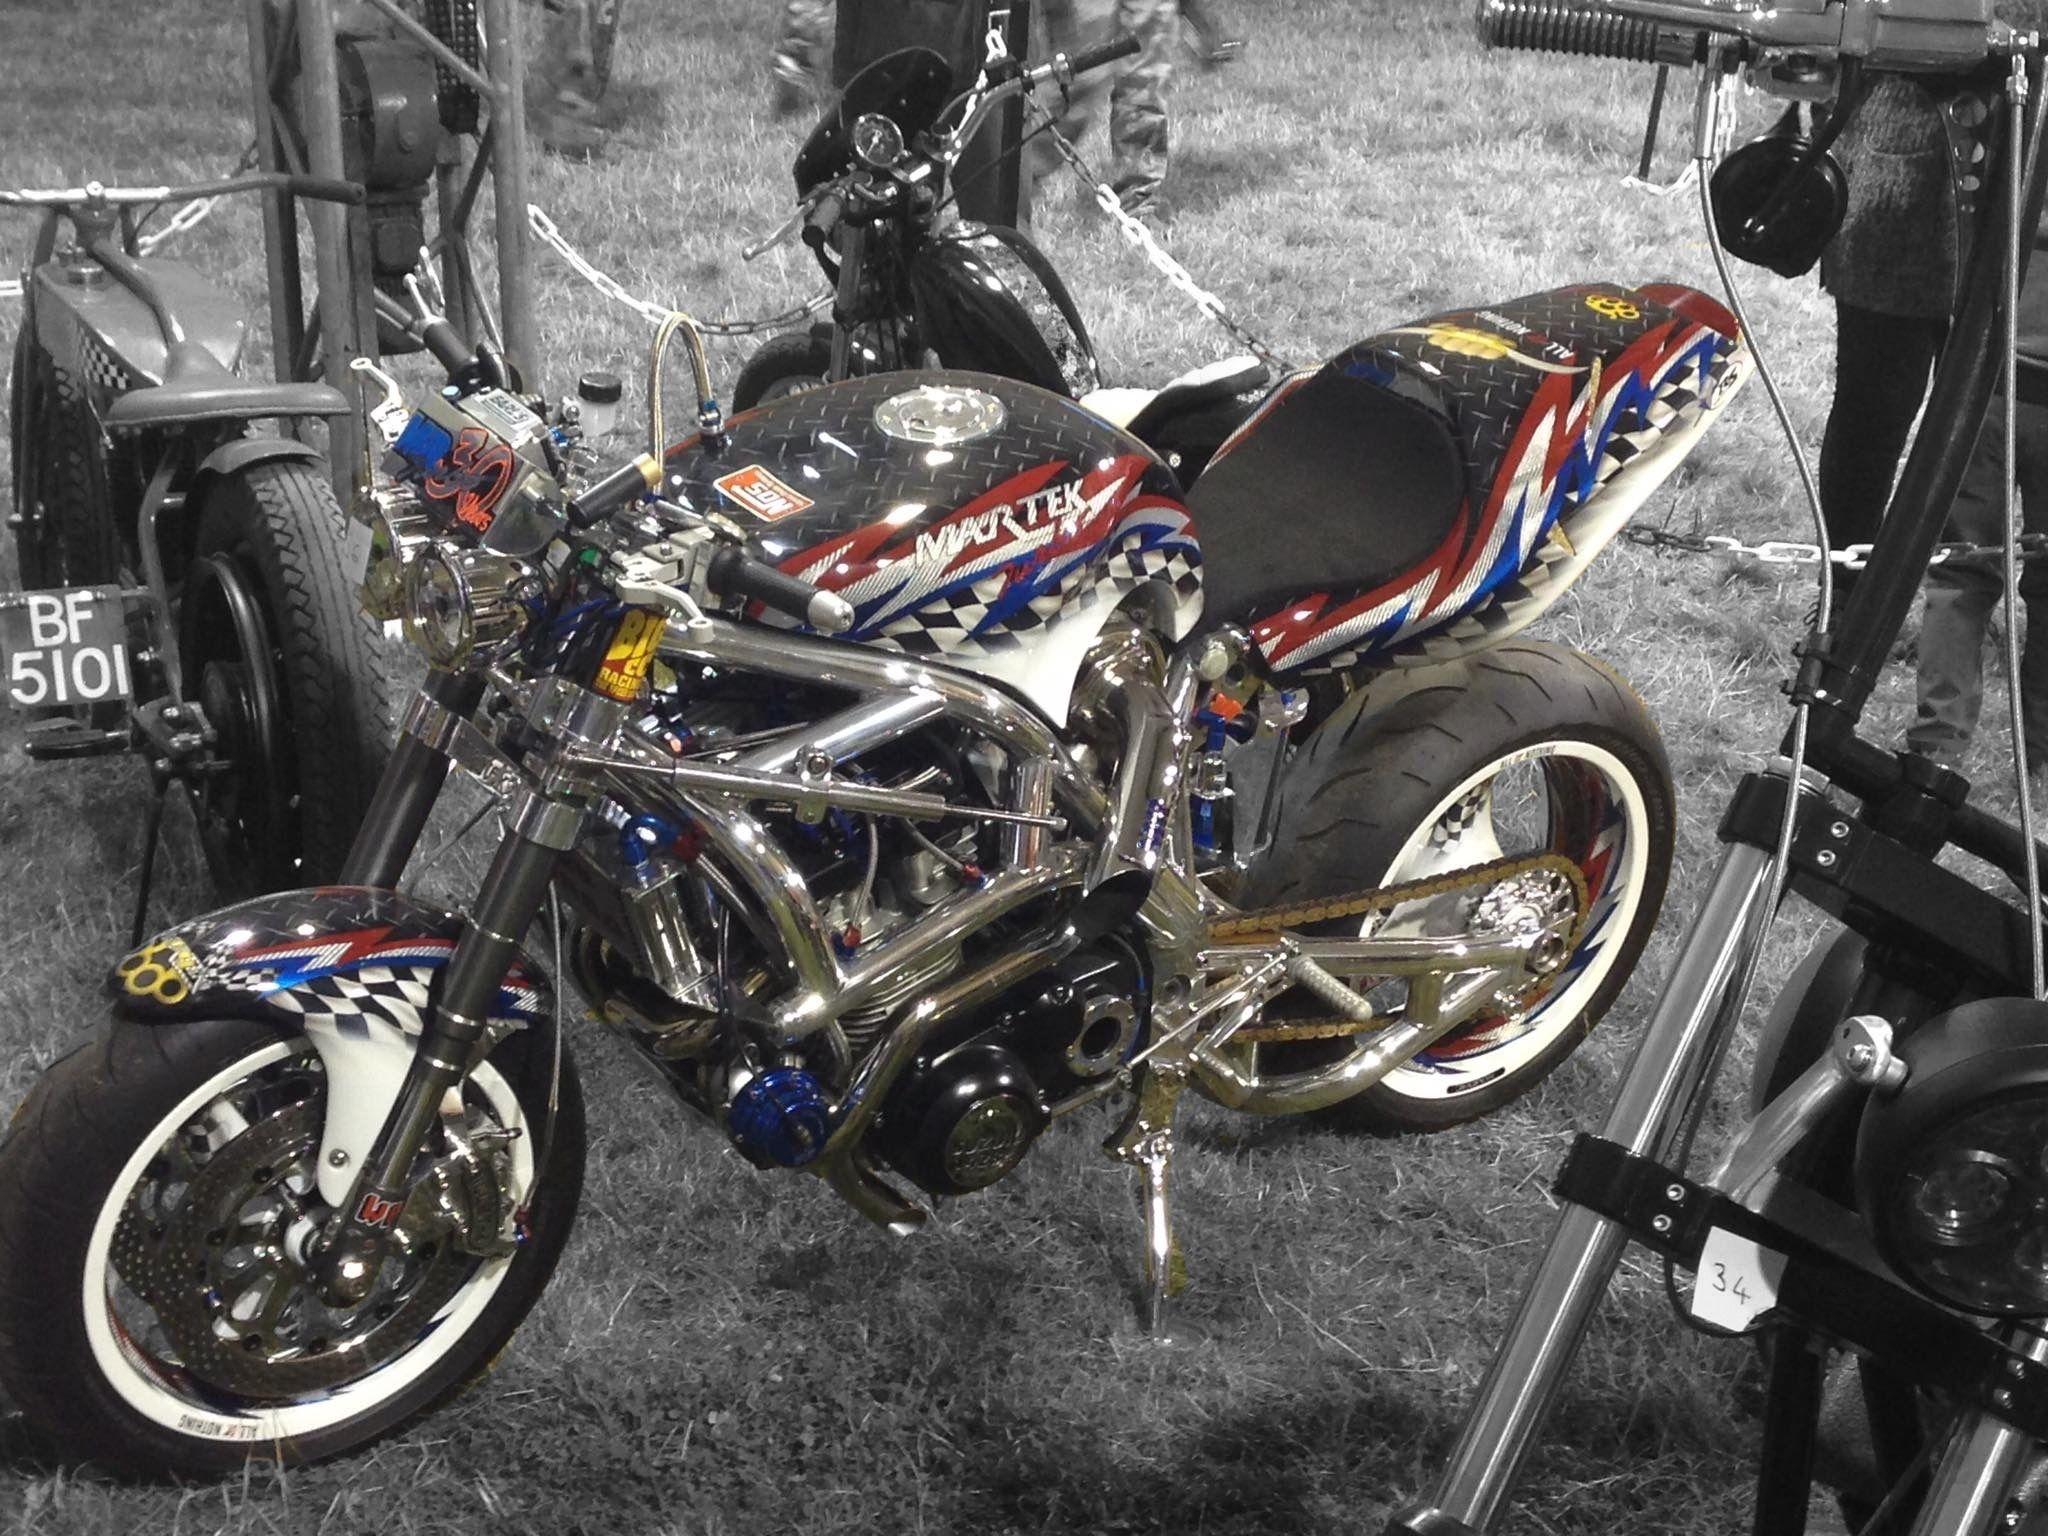 Pin By Sean Pattinson On Spondon N Martek Custom Framing Motorcycle Cafe Racer